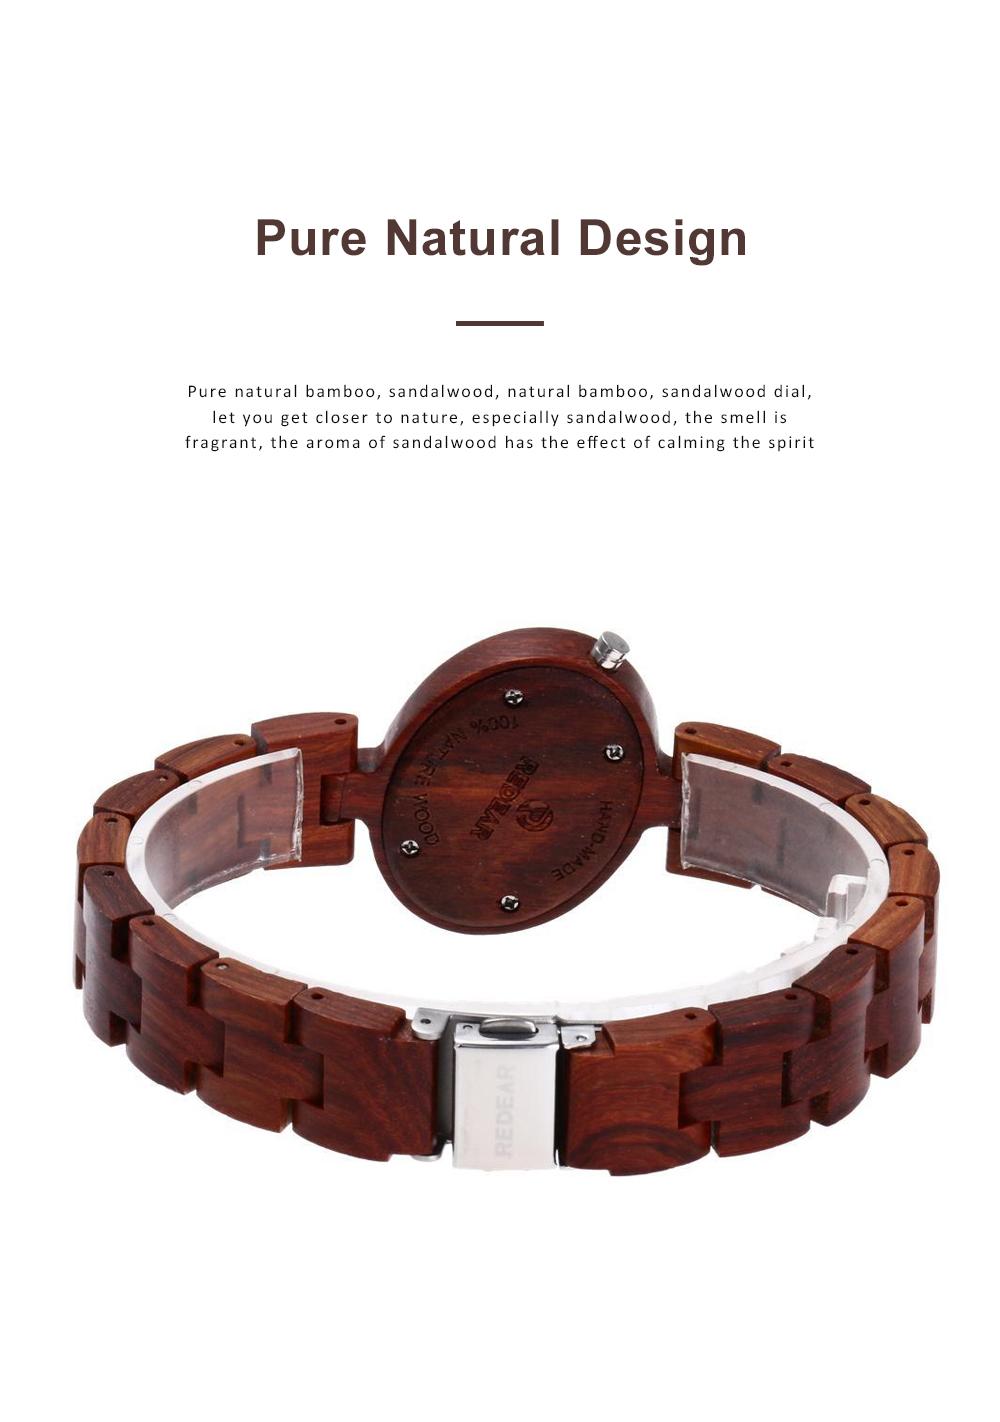 Women Watches Elegant Wood Band Stainless Steel Quartz Wrist Bamboo Watch With Waterproof Wristwatch For Ladies Girls 3